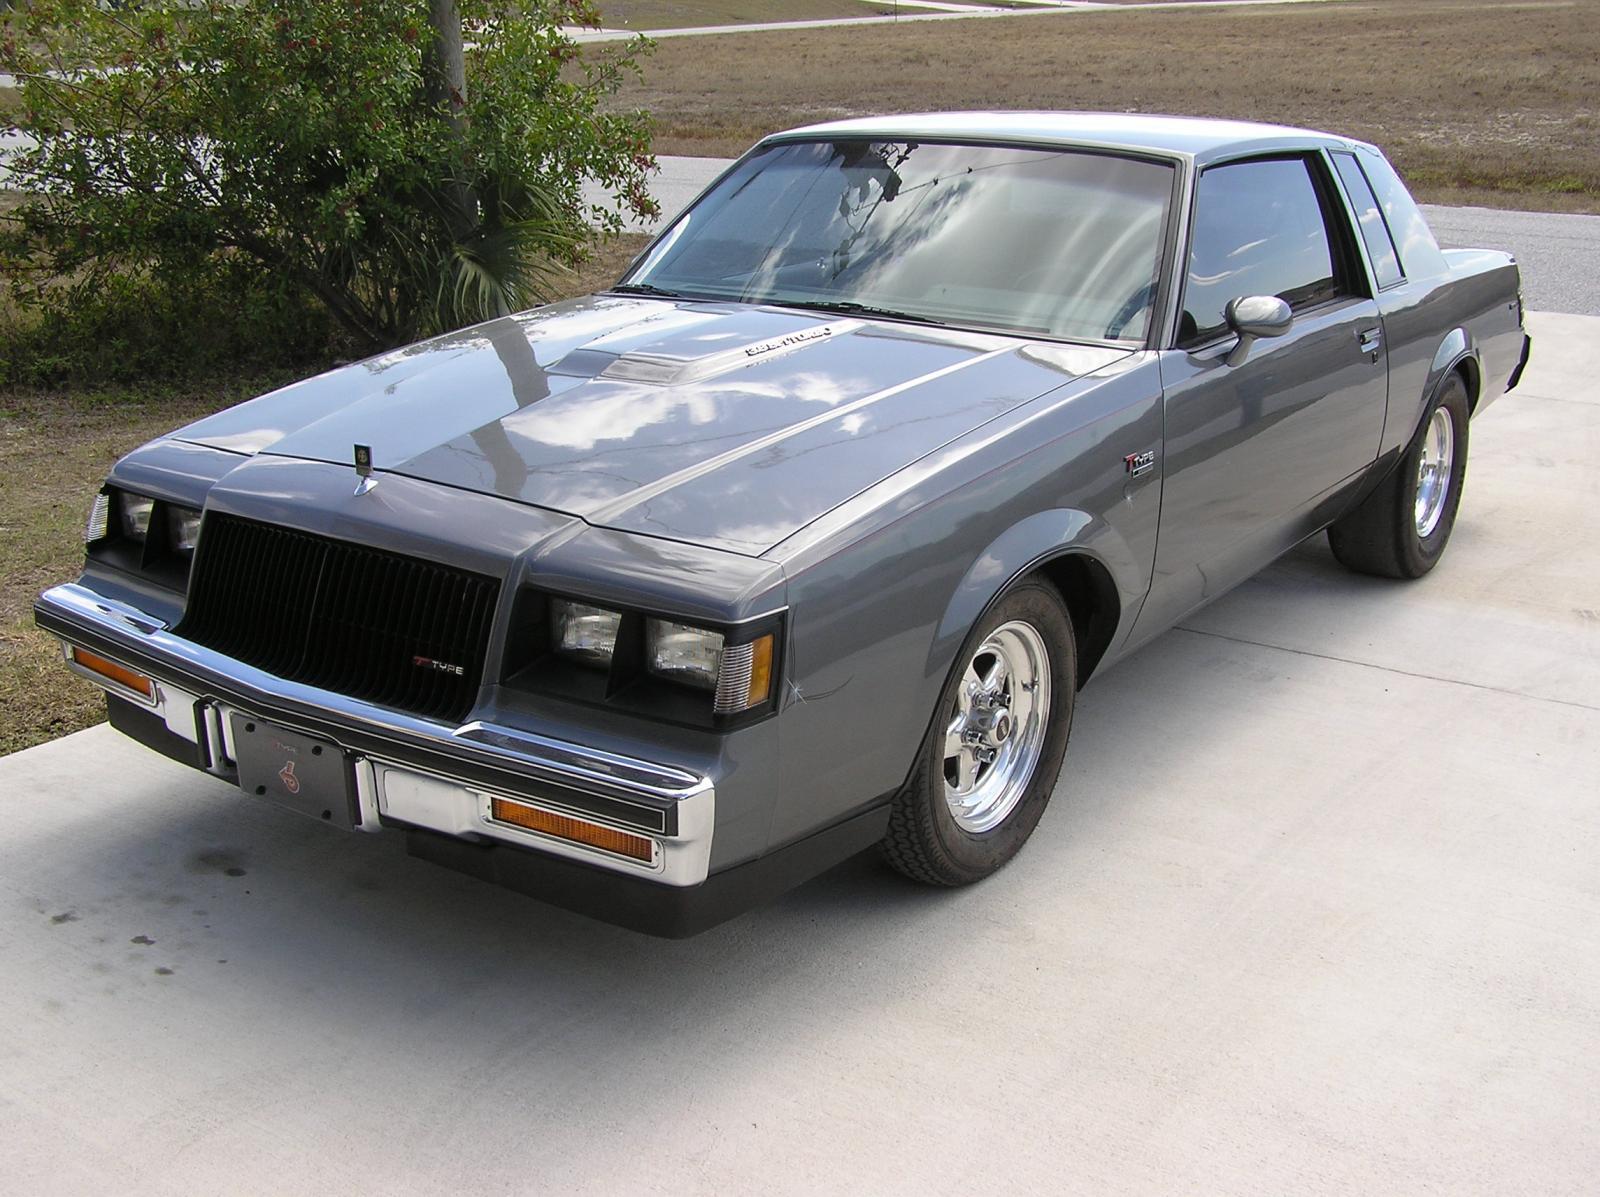 sale cars regal coupe american phoenix near arizona car type t for classic buick